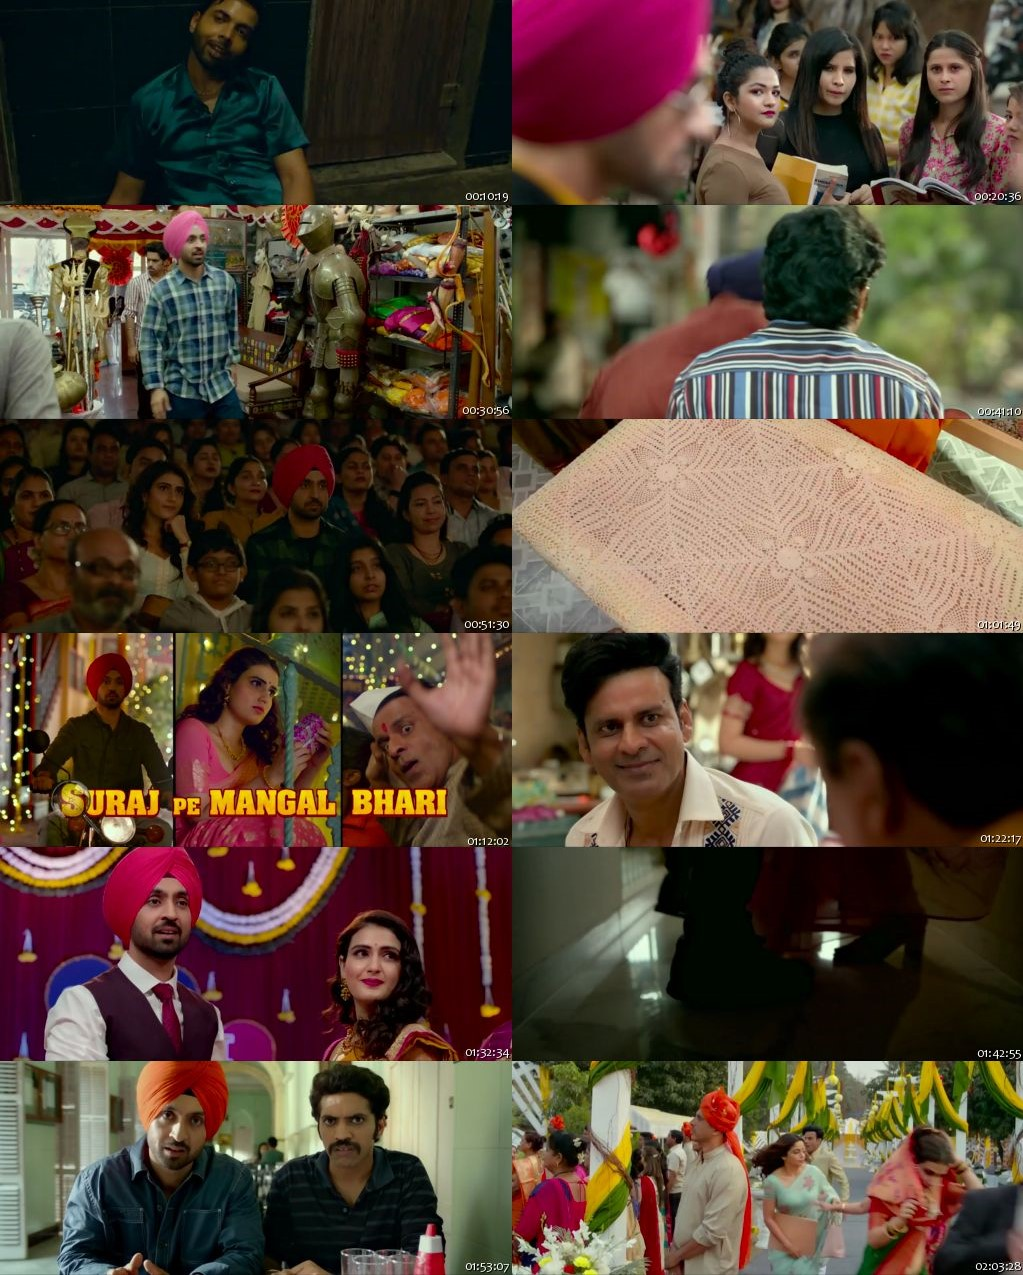 Suraj Pe Mangal Bhari 2020 Full Hindi Movie Online Watch HDRip 720p